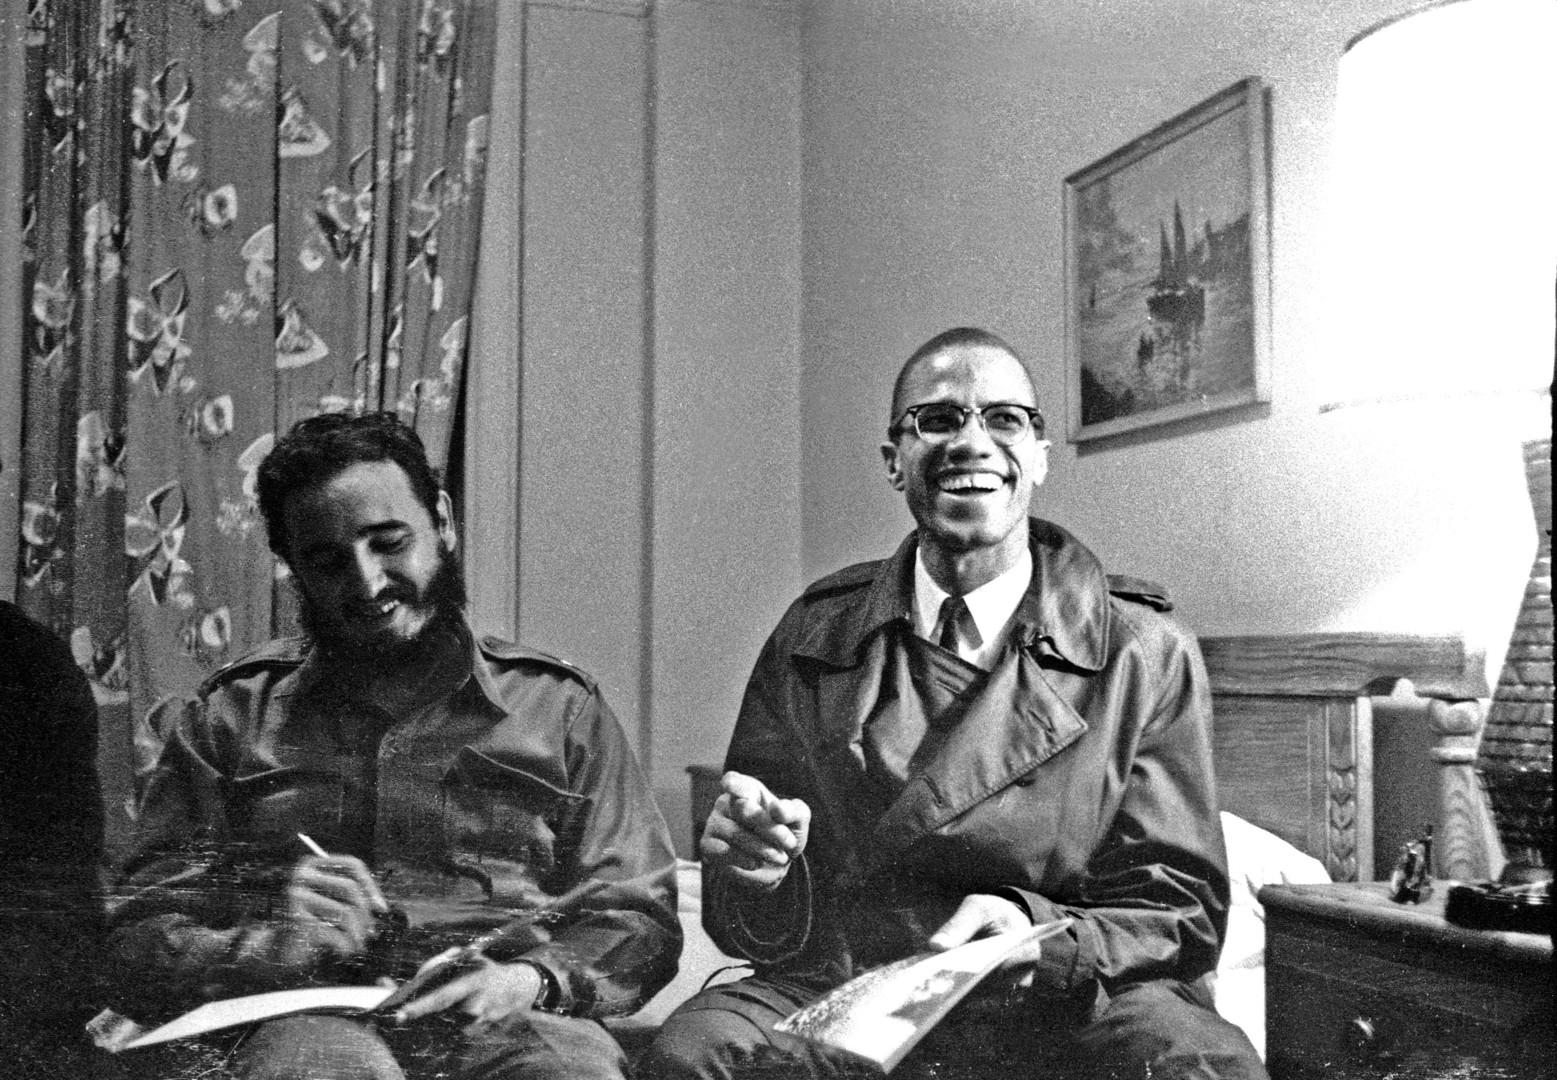 Les tentatives d'assassinat de la CIA sur Fidel Castro les plus farfelues